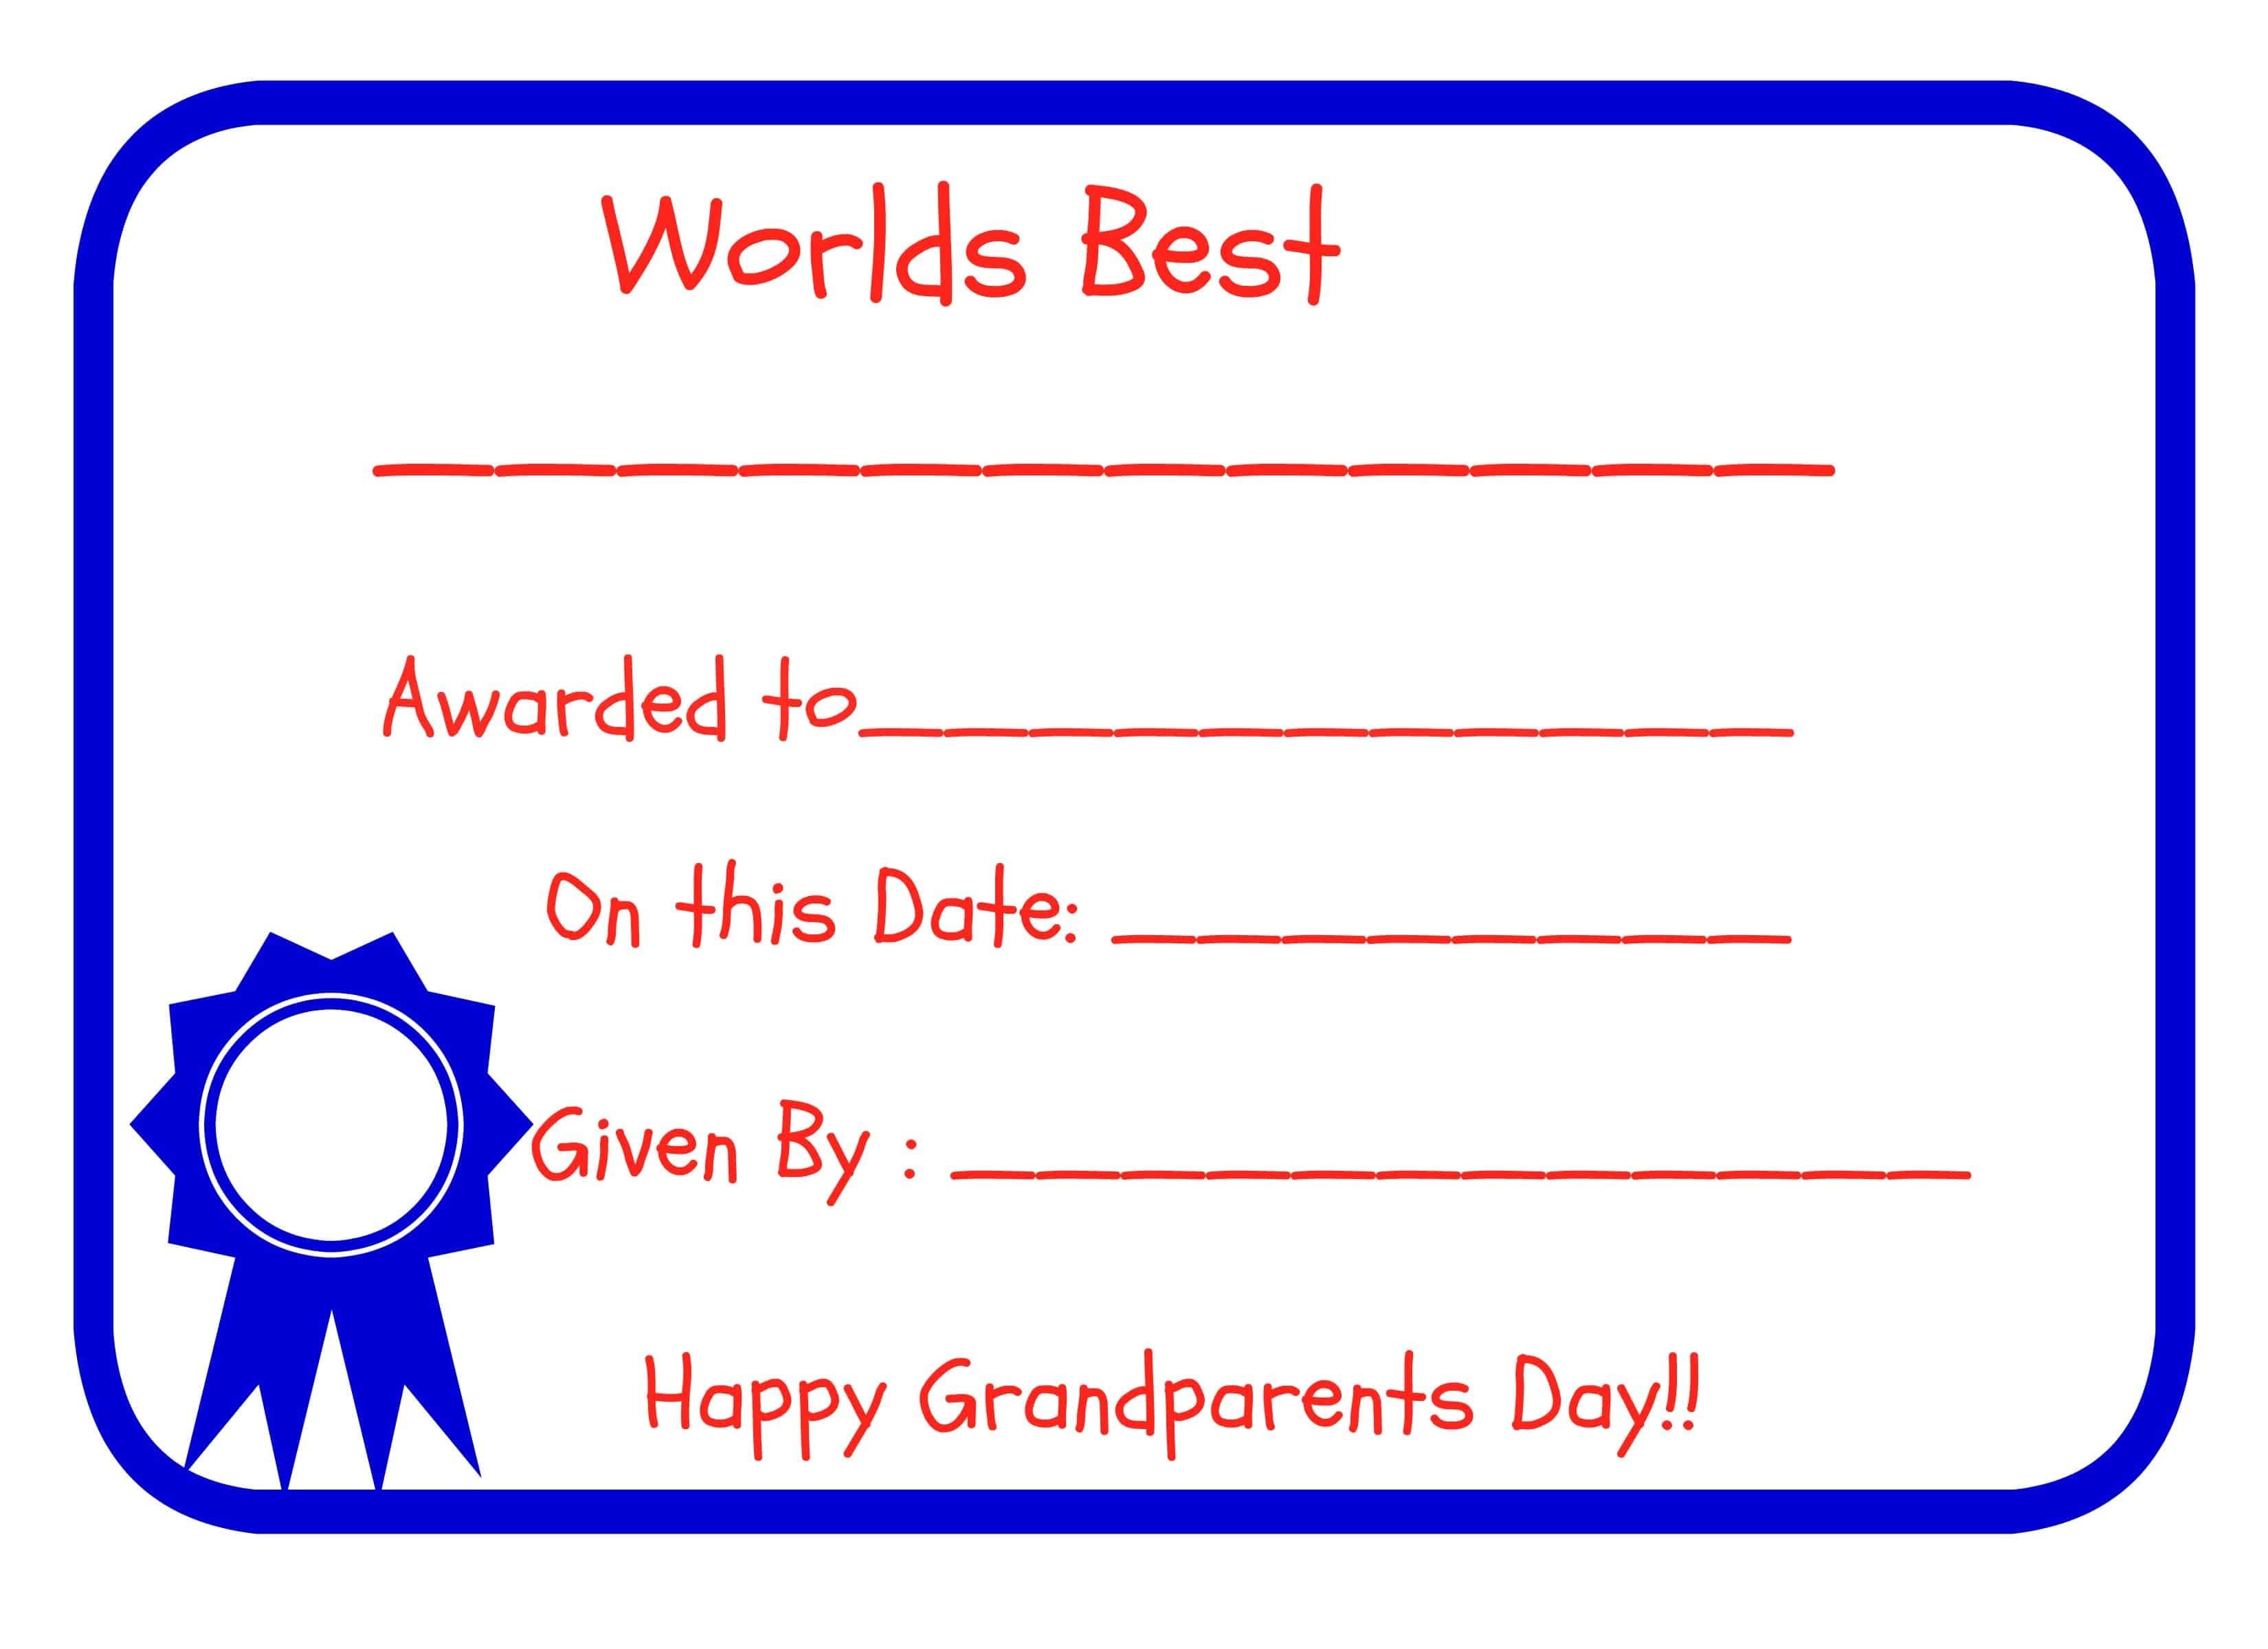 Grandparents Day - Free Printables! - Grandparents Certificate Free Printable